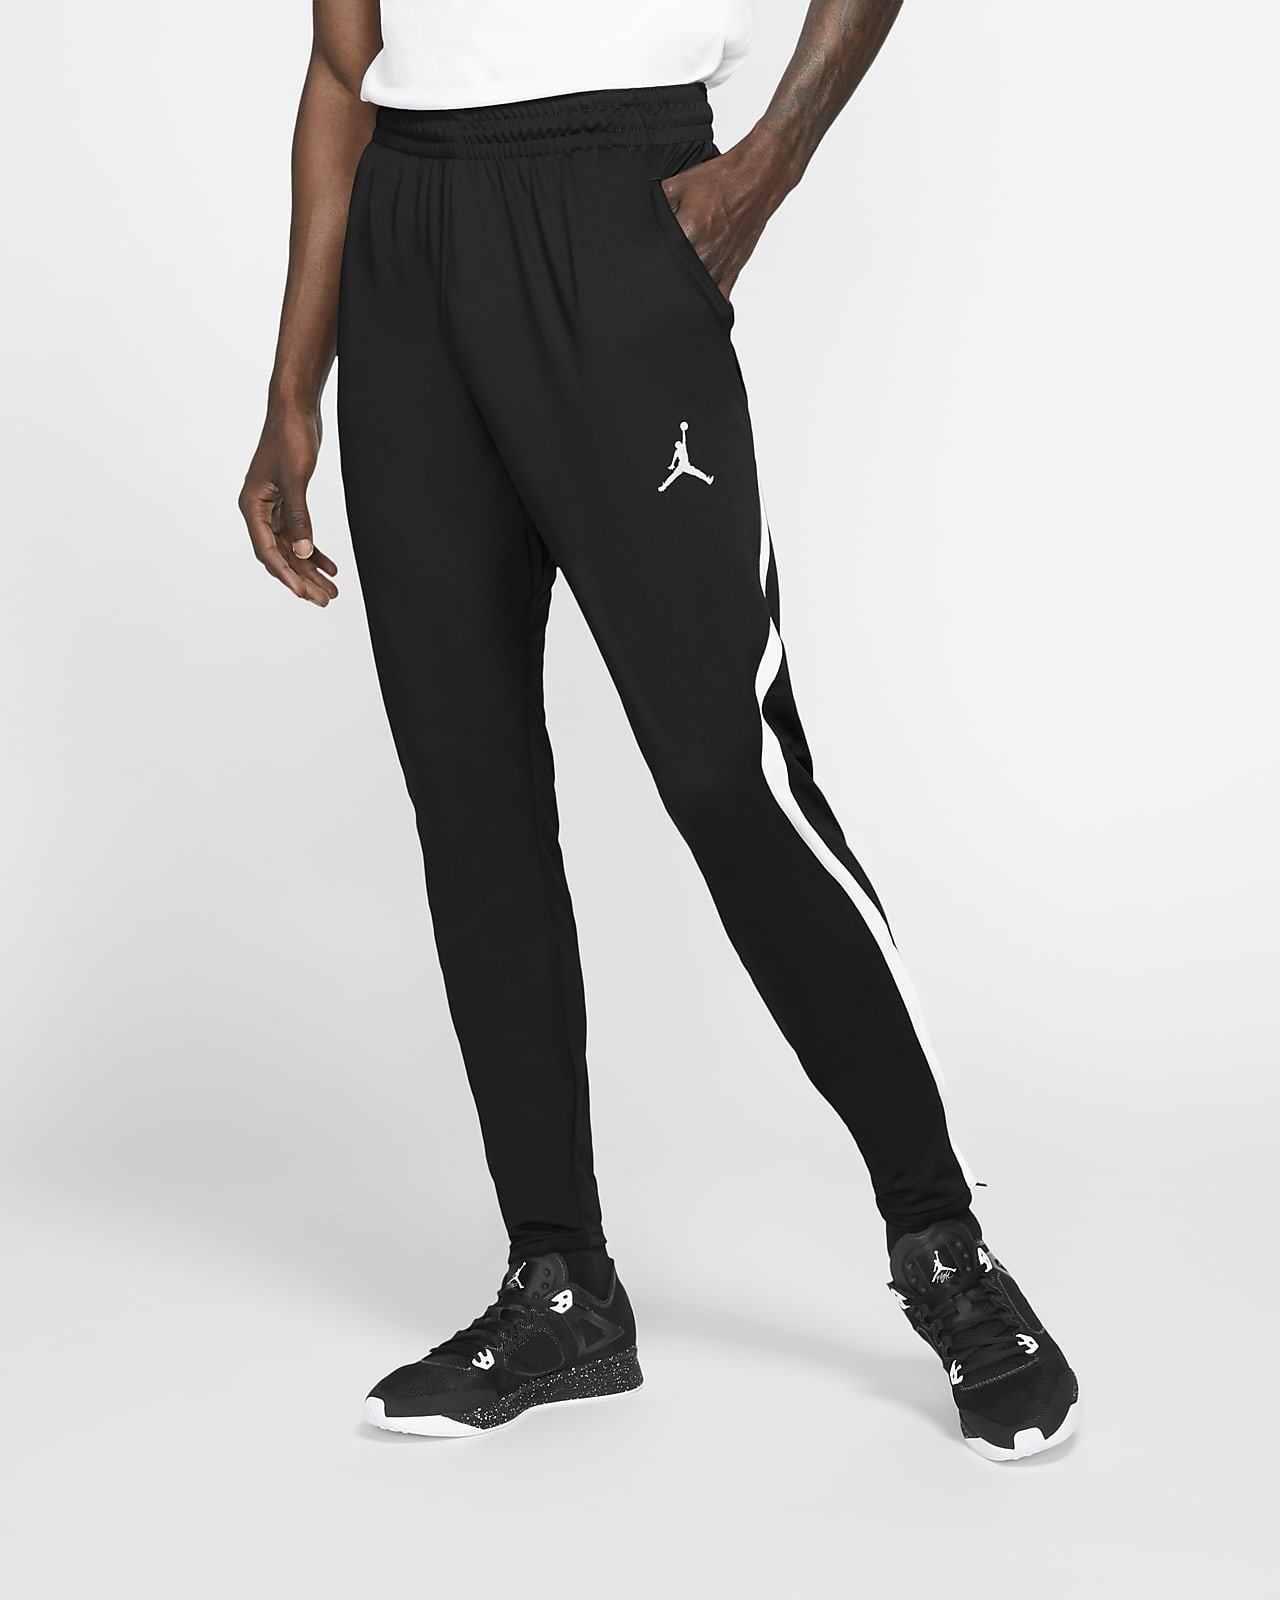 Jordan 23 Alpha Dri-FIT Men's Trousers